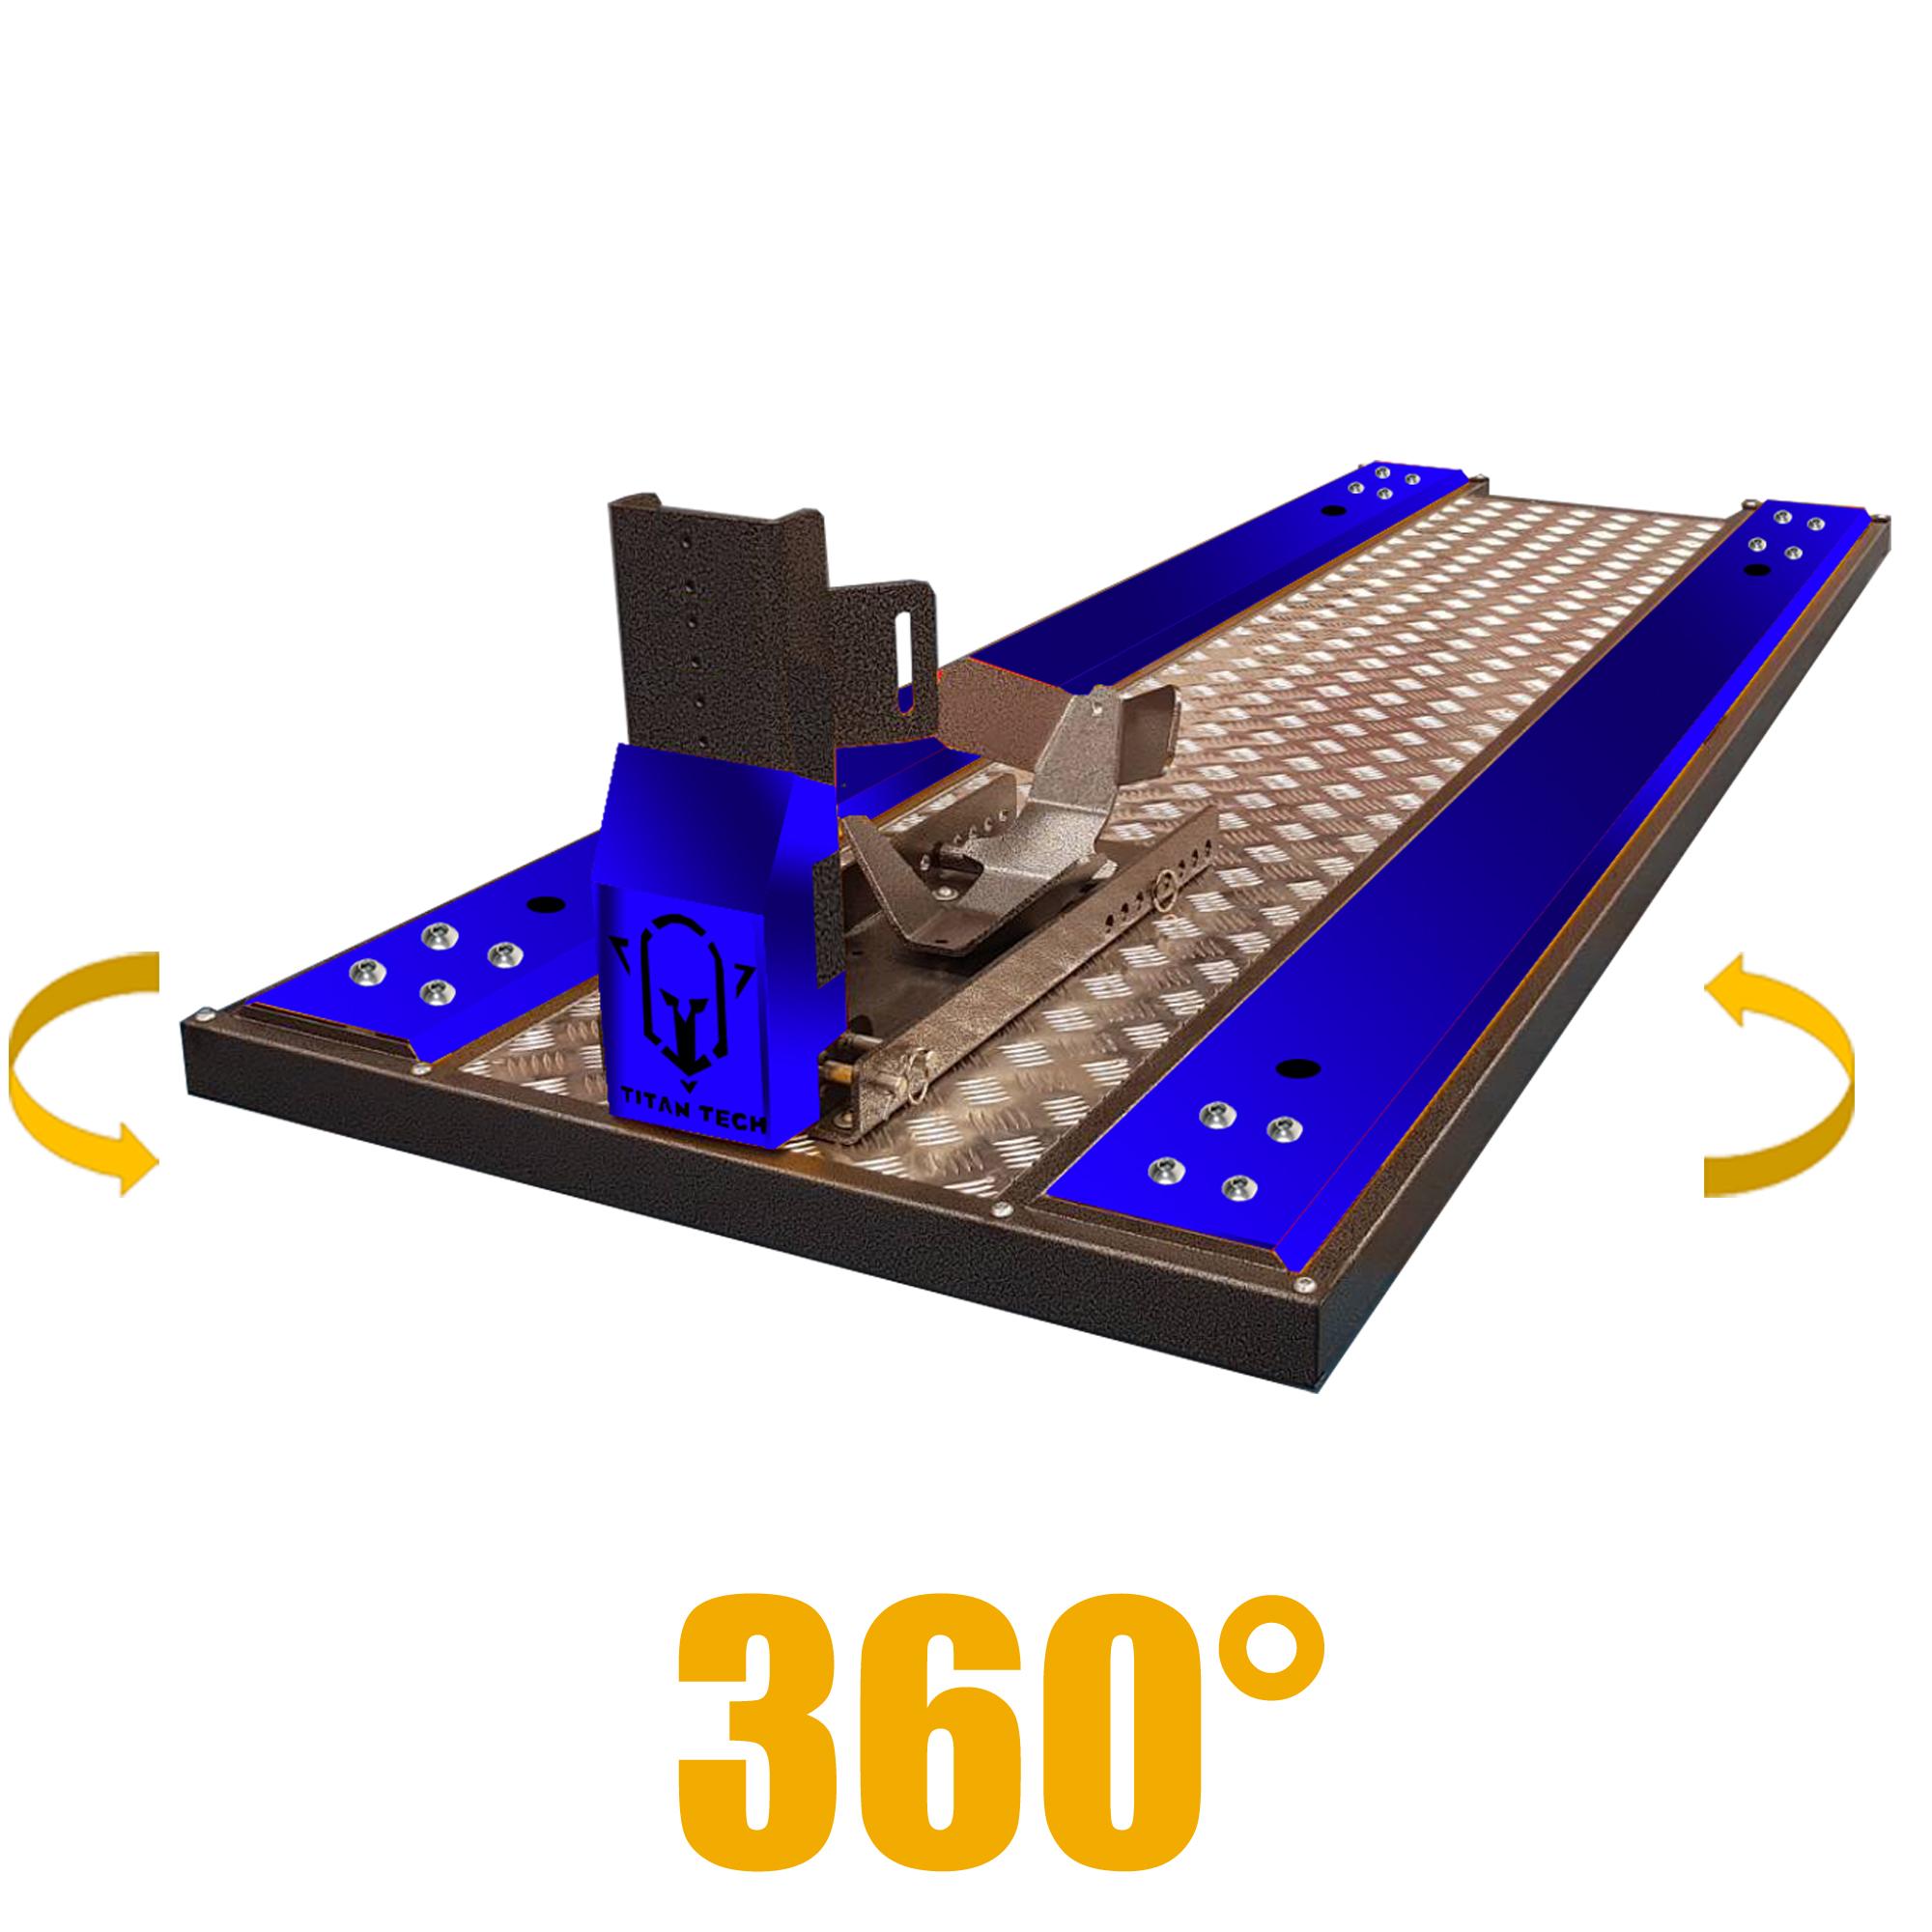 Titan Tech แพลตฟอร์ม มอเตอร์ไซค์บิ๊กไบค์ 360° (สีน้ำเงิน)